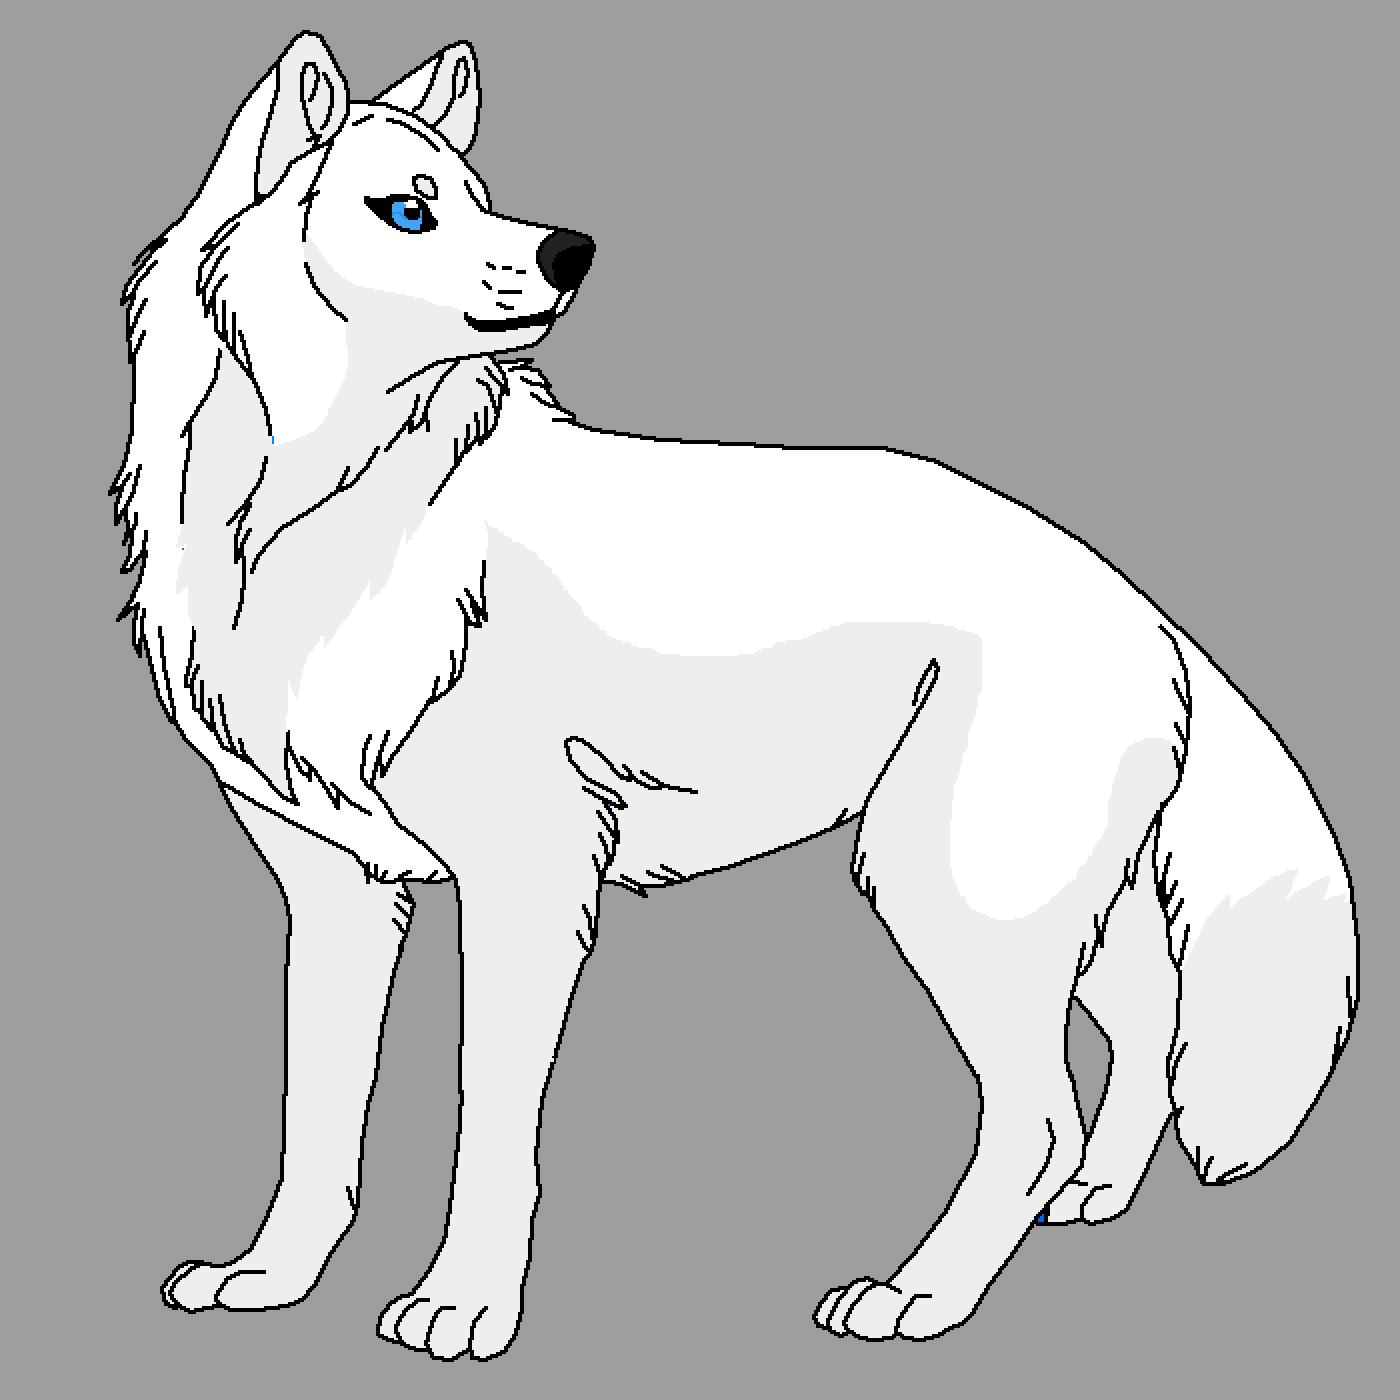 main-image-Moon Moon Doggo  by tnabors03